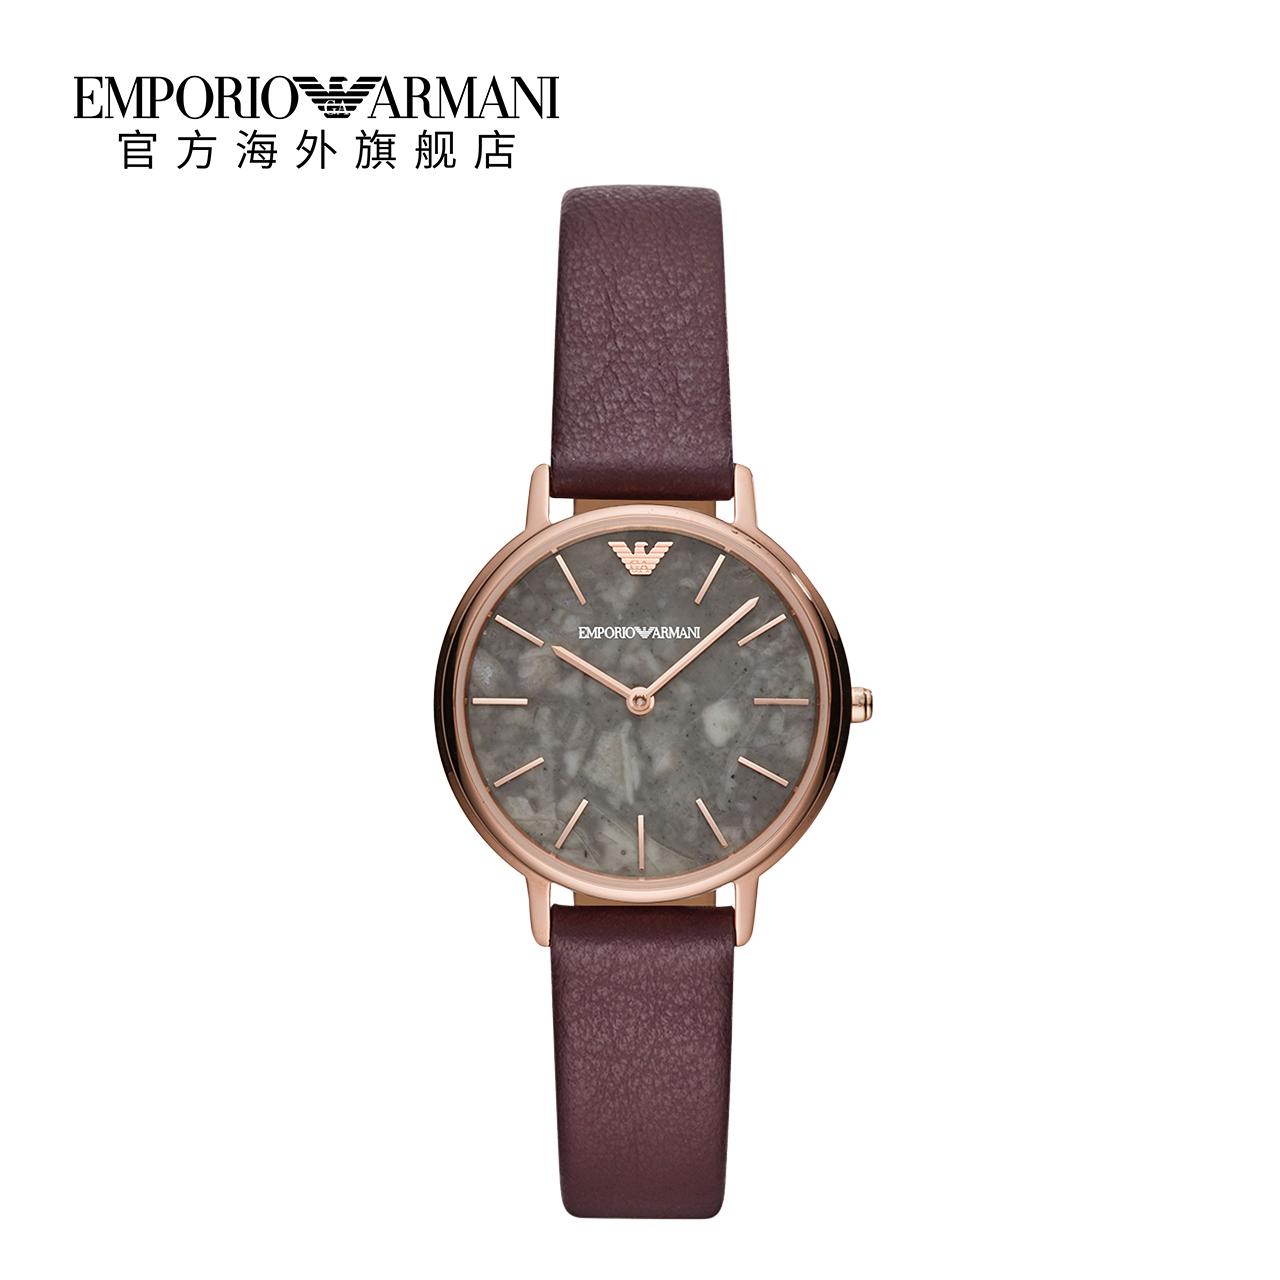 Armani 阿玛尼正品小表盘女士手表小巧个性时尚休闲石英表AR11172